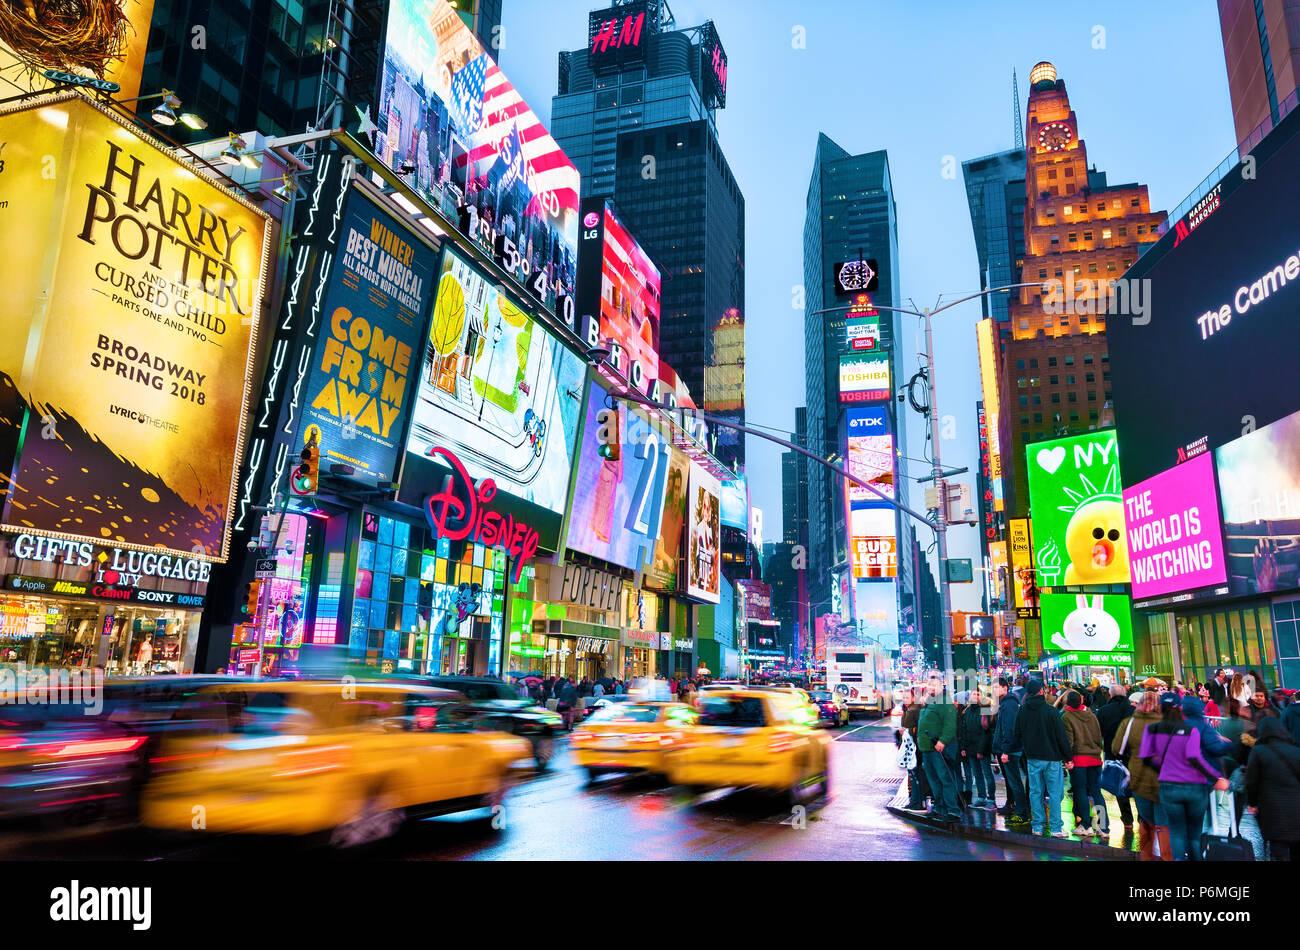 New York Times Square Manhattan New York City Lights Photo Stock